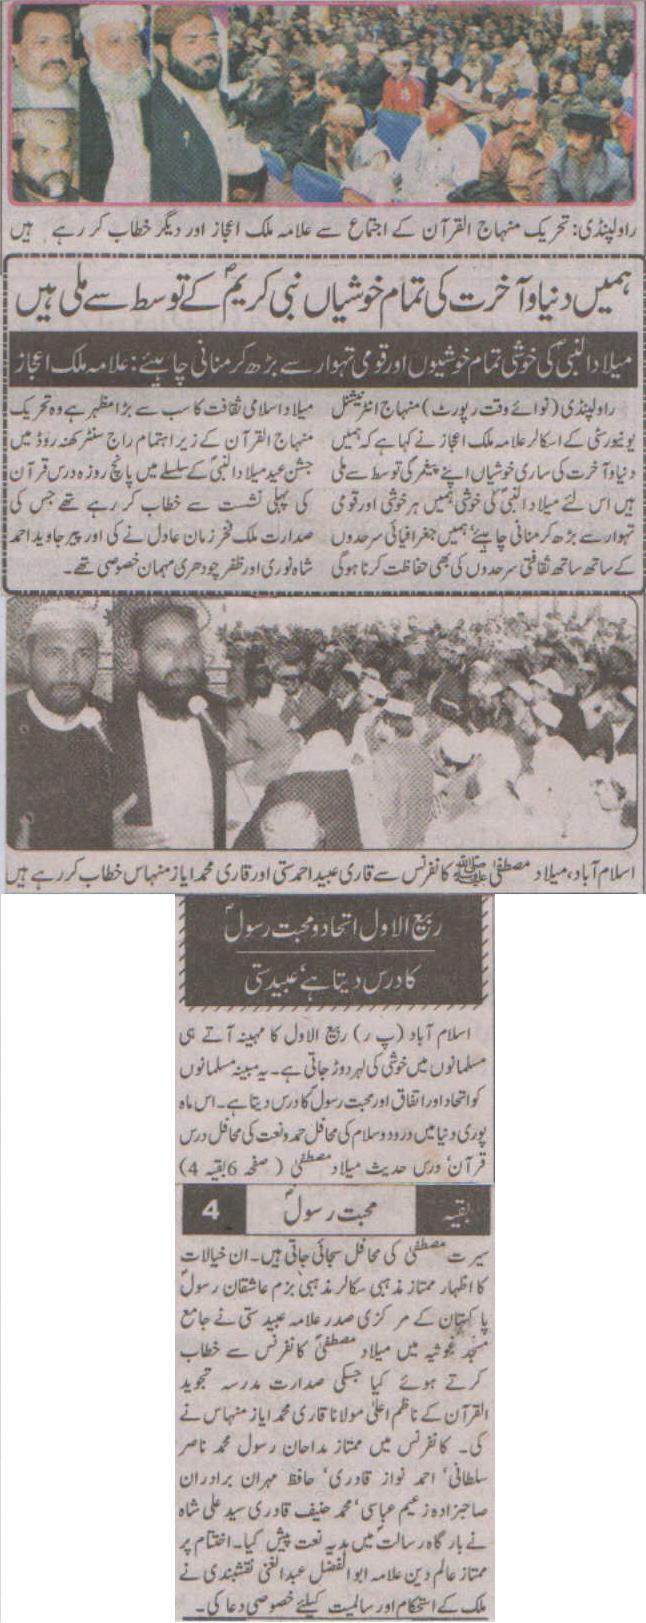 تحریک منہاج القرآن Minhaj-ul-Quran  Print Media Coverage پرنٹ میڈیا کوریج Daily Niwa.E.Waqt